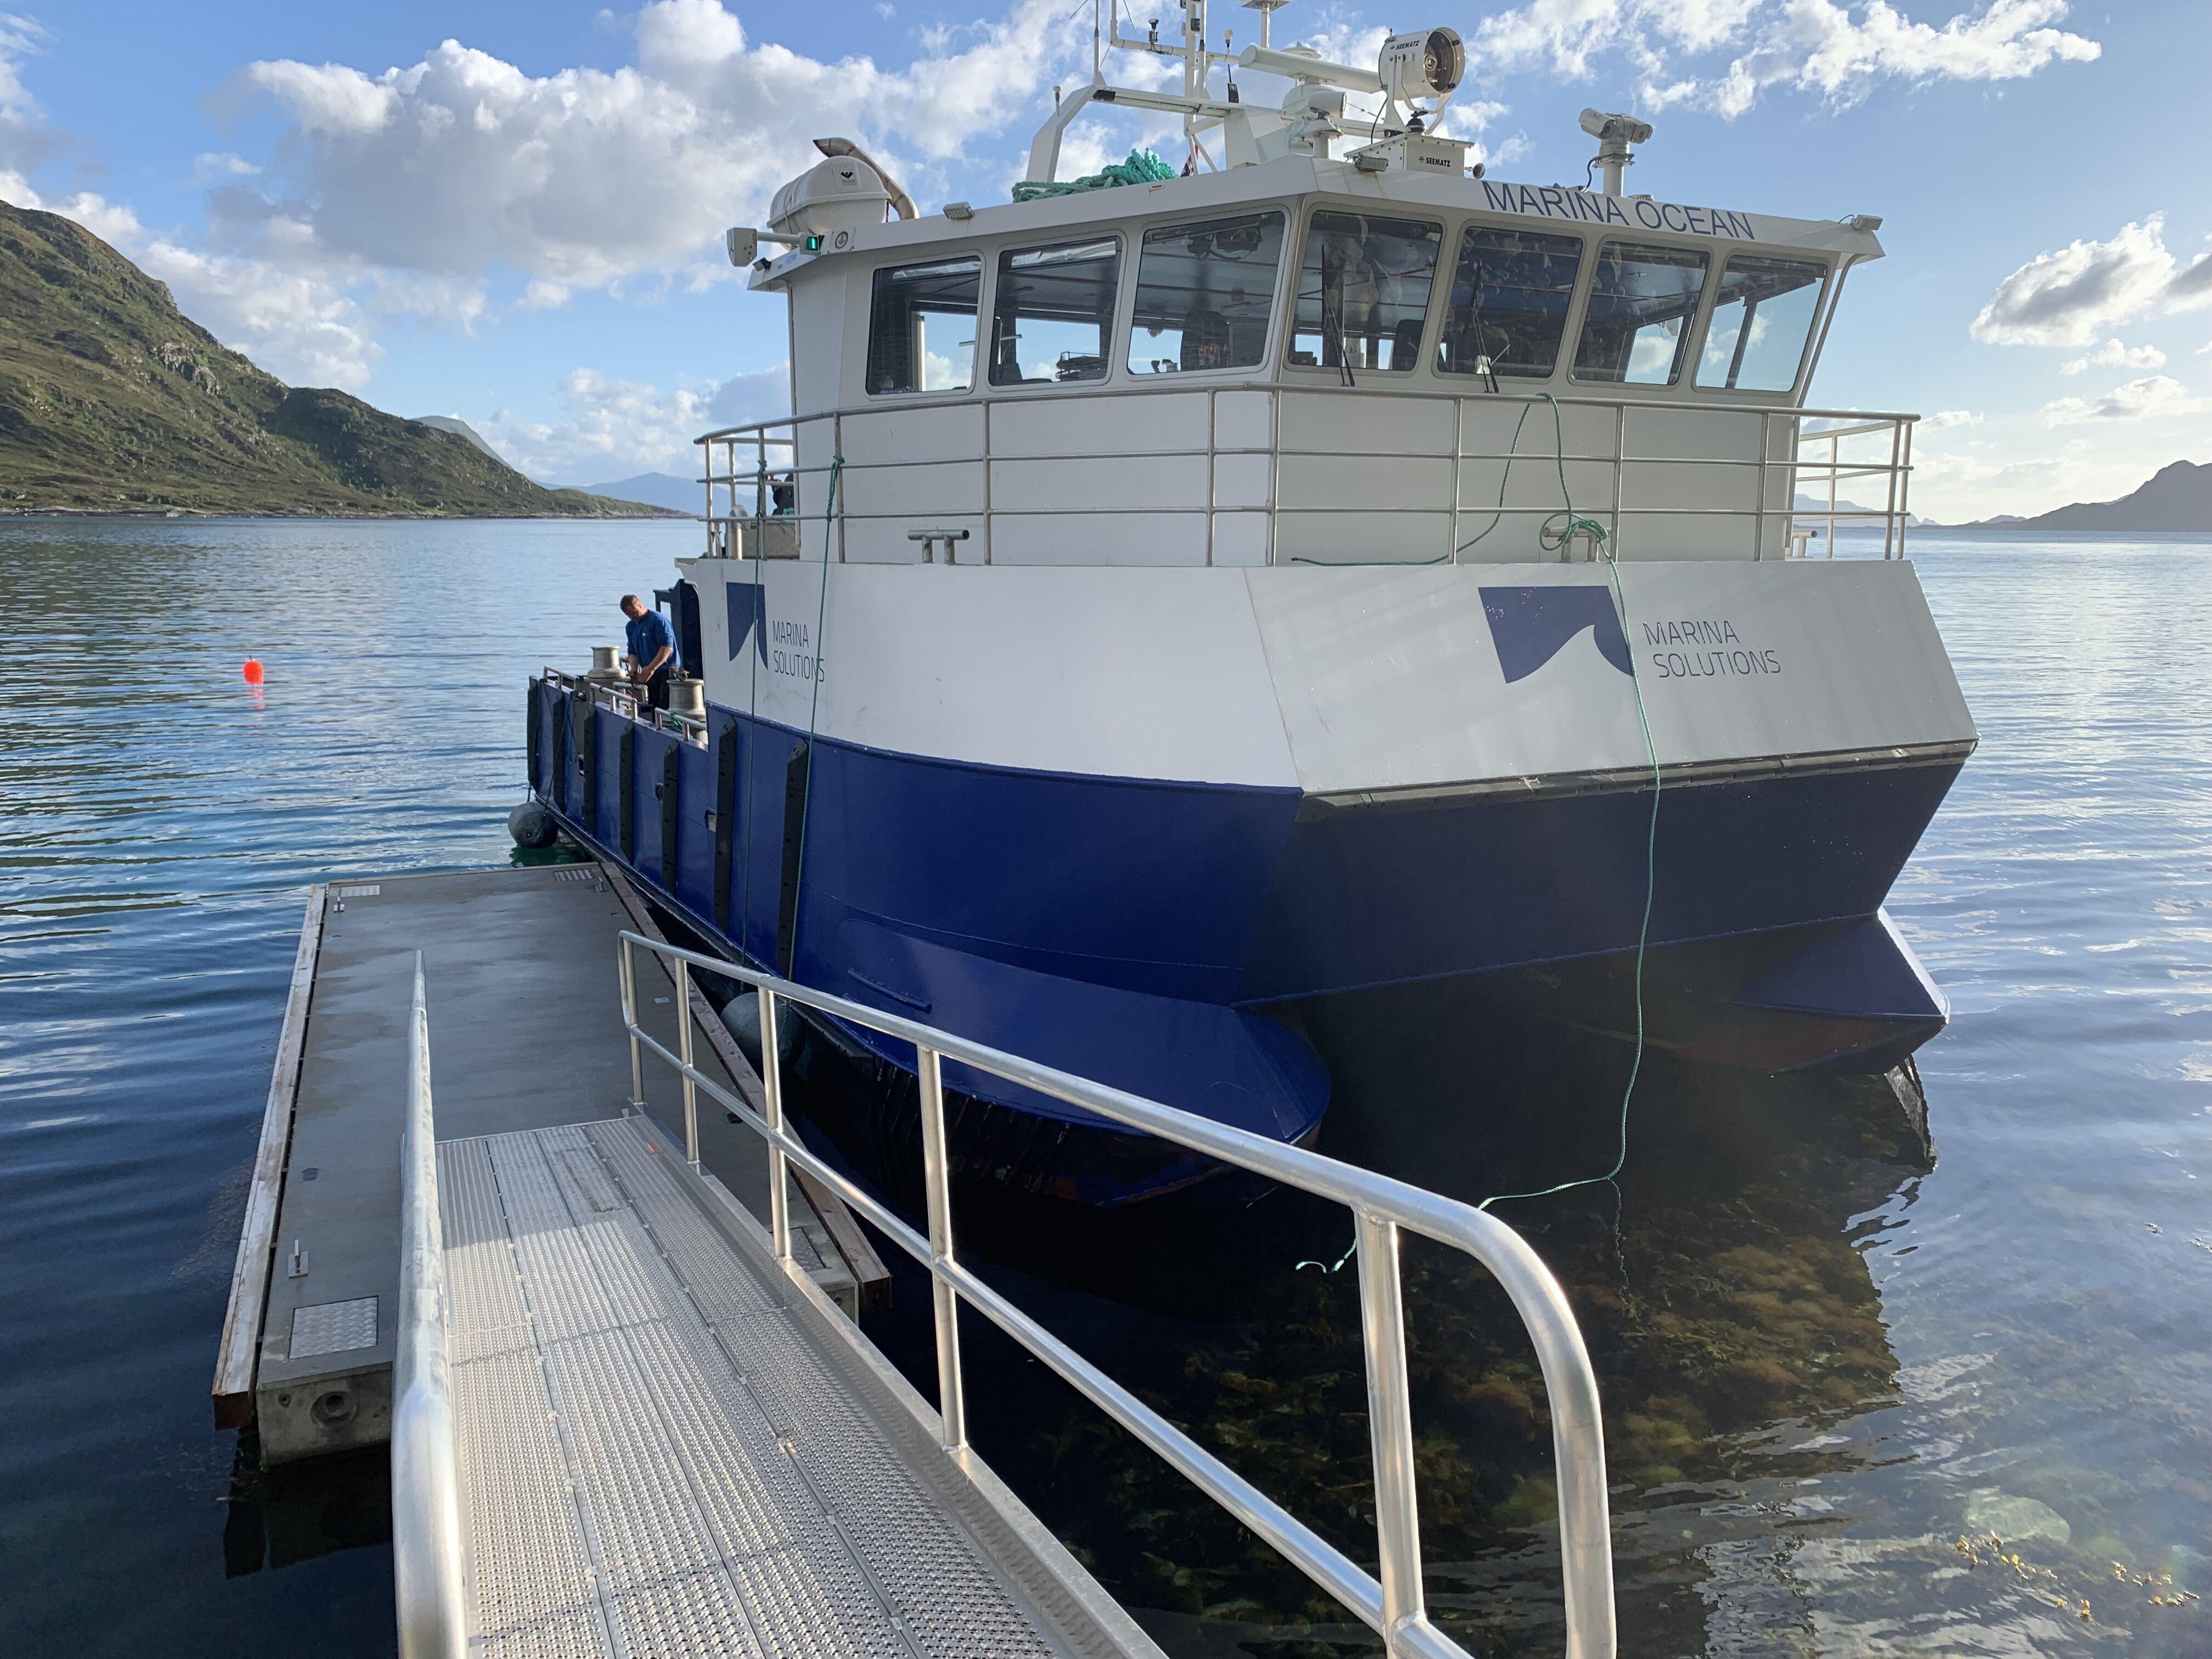 https://marinasolutions.no/uploads/Haugsbygda-Gursken-Larsnes-landstedsbrygge-Marina-Ocean.jpeg